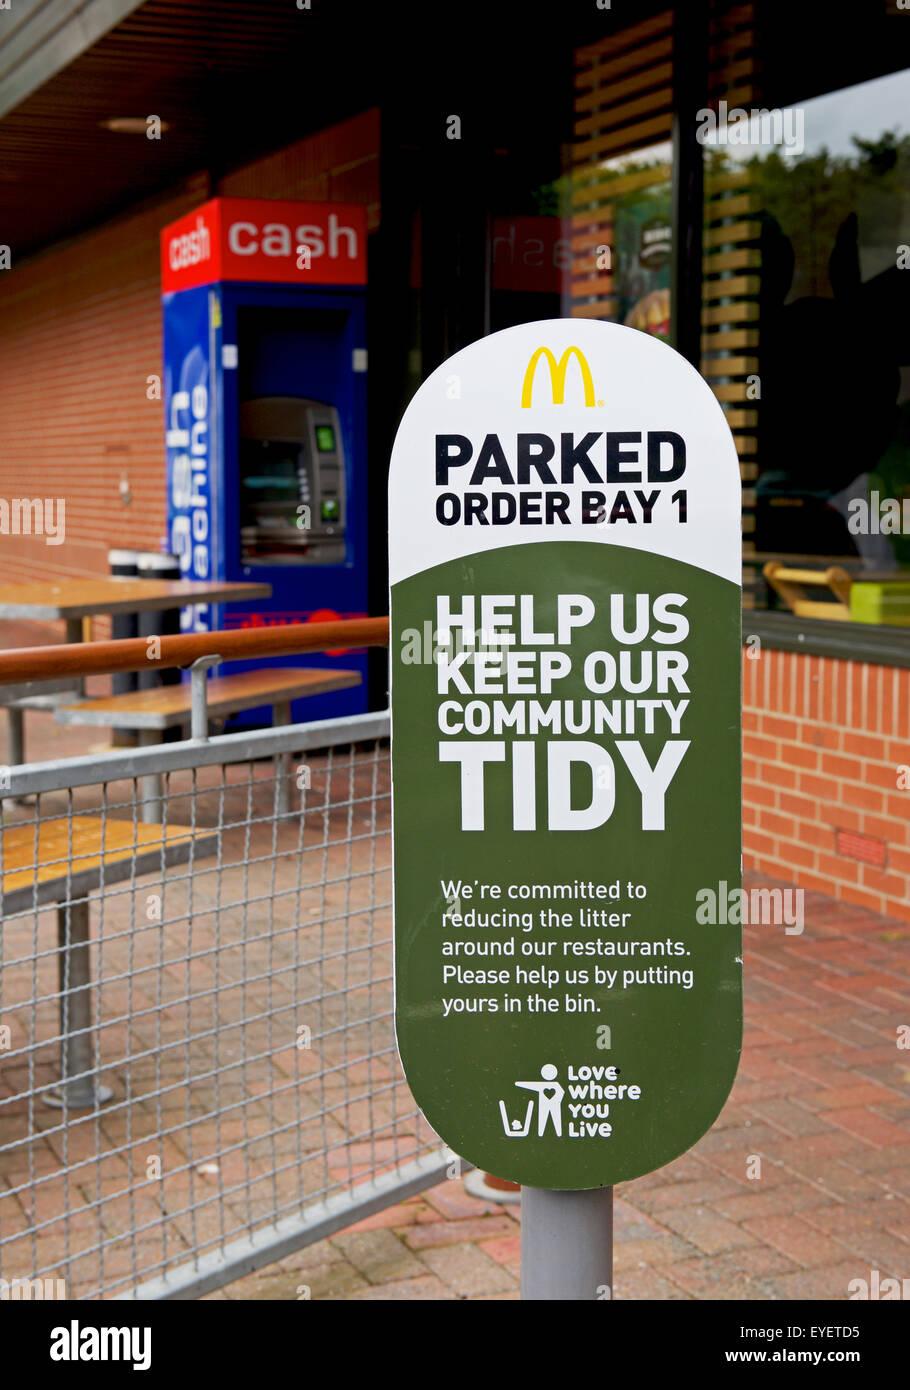 Sign outside McDonalds restaurant asking customers not to leave litter, UK - Stock Image